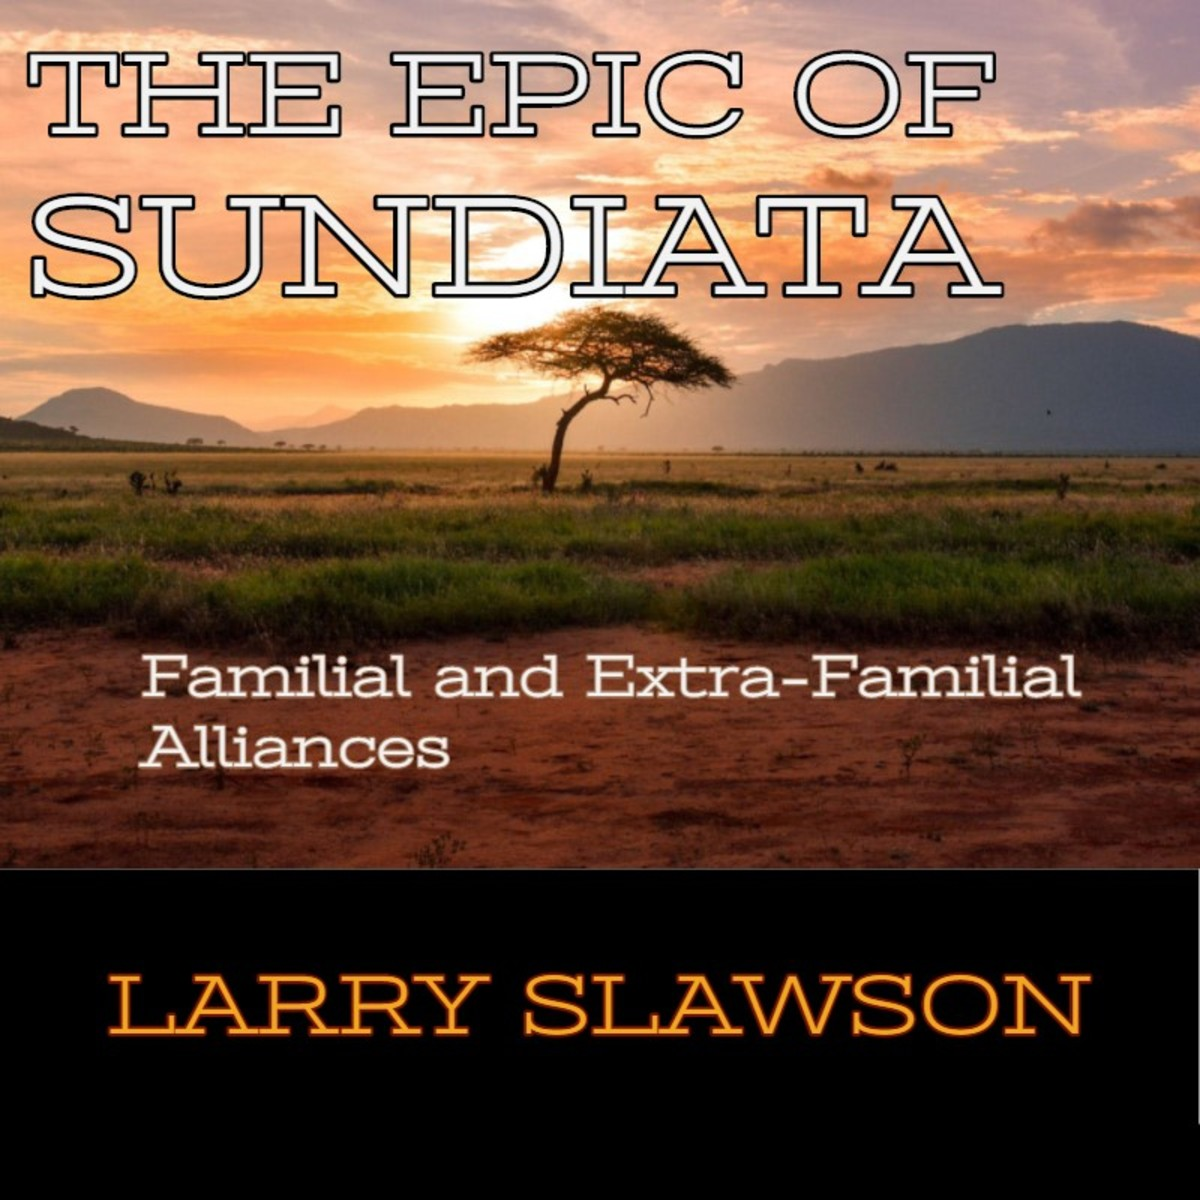 The Epic of Sundiata